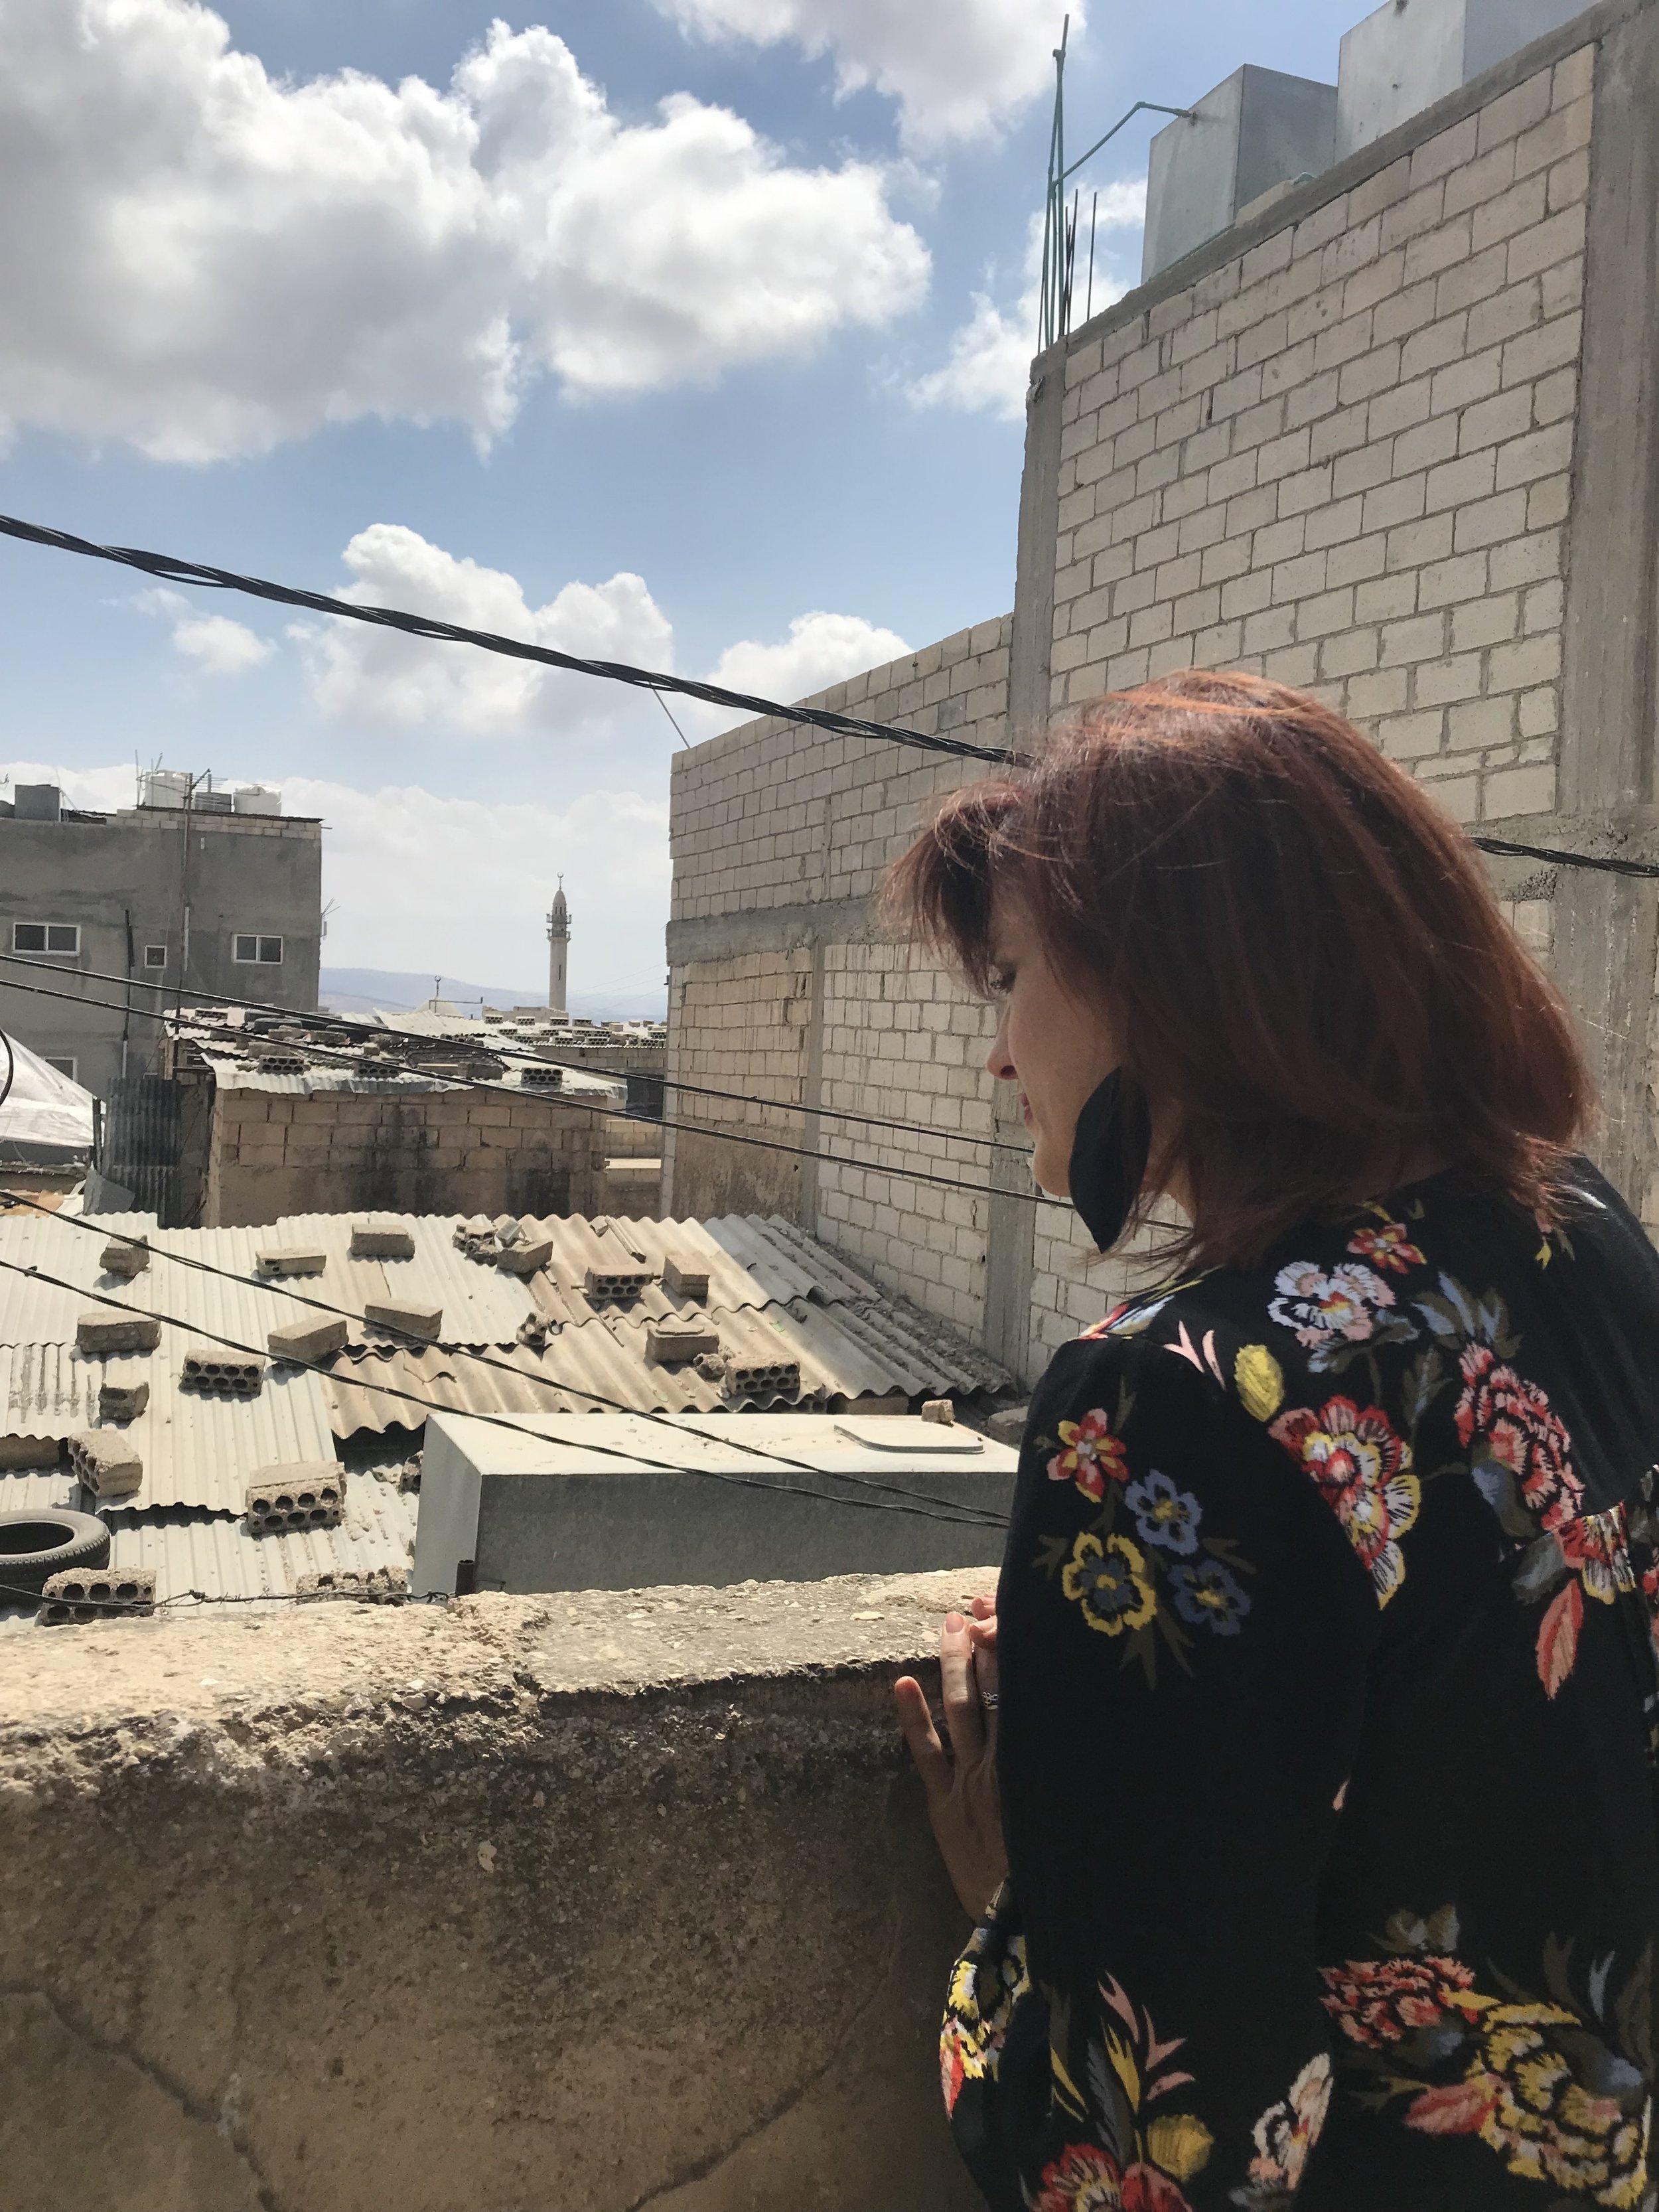 Gaza Palestinian refugee camp, Jerash, Jordan. September, 2018.